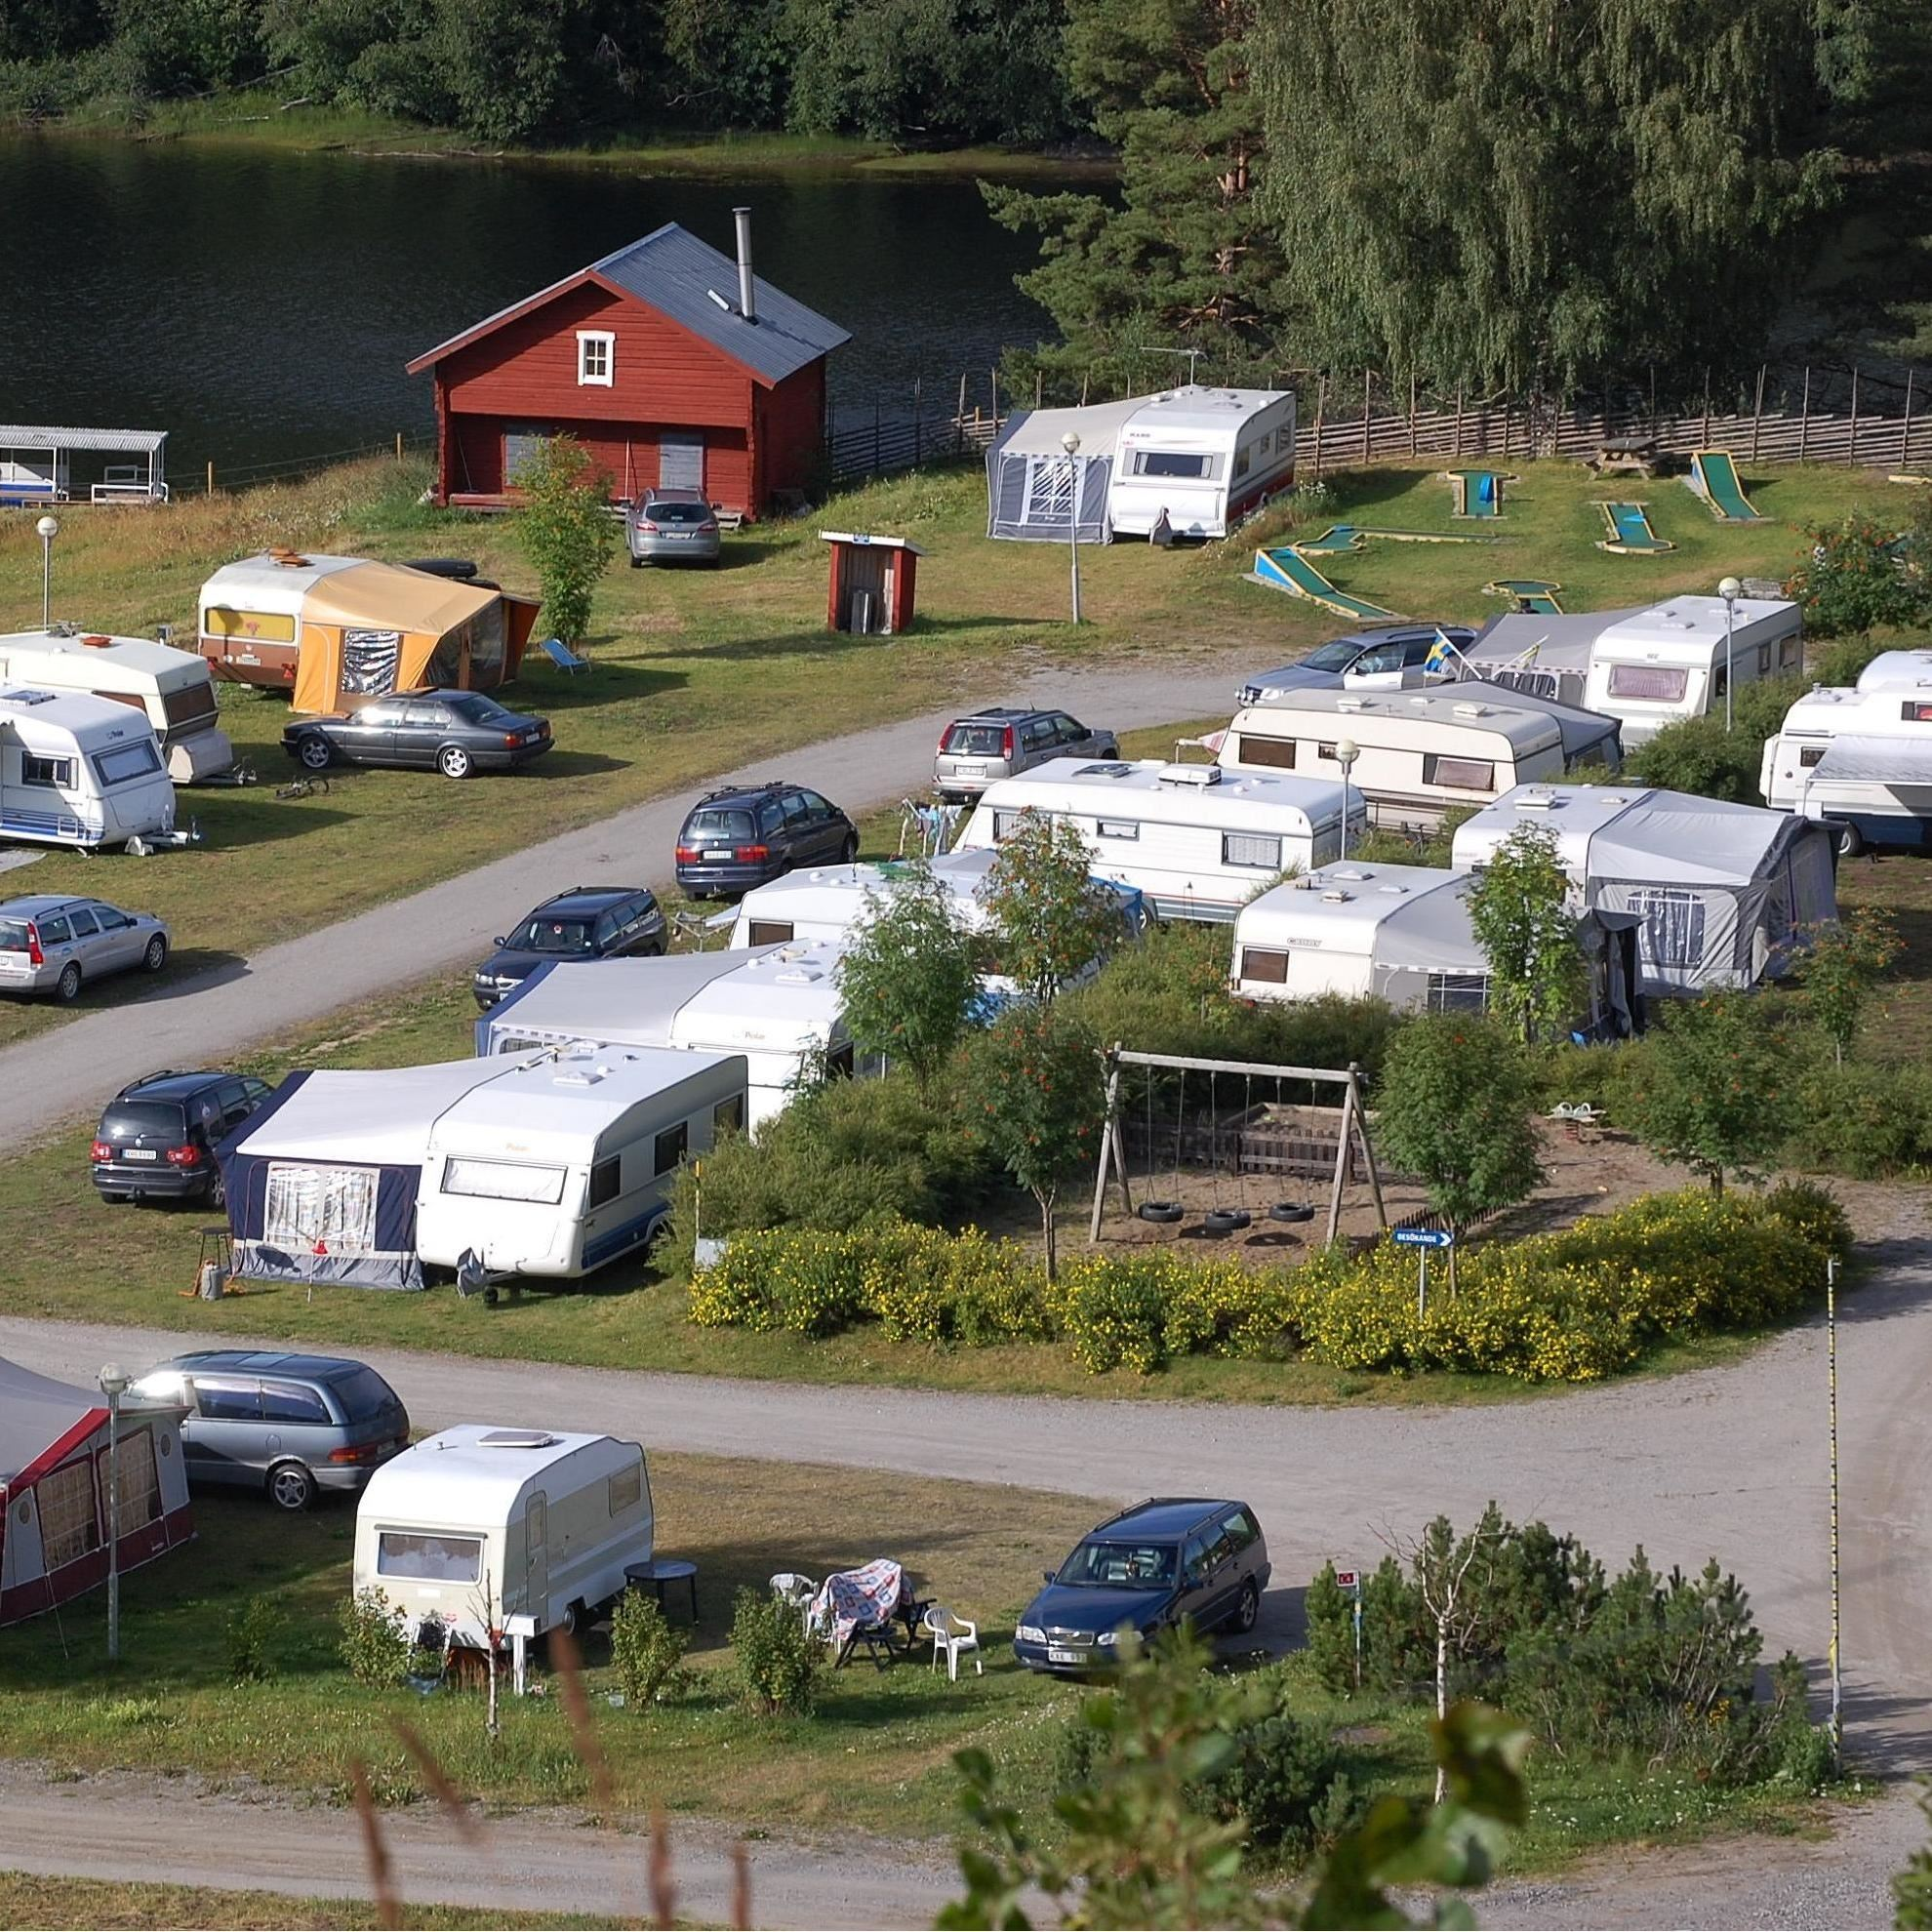 Ramsele Camping